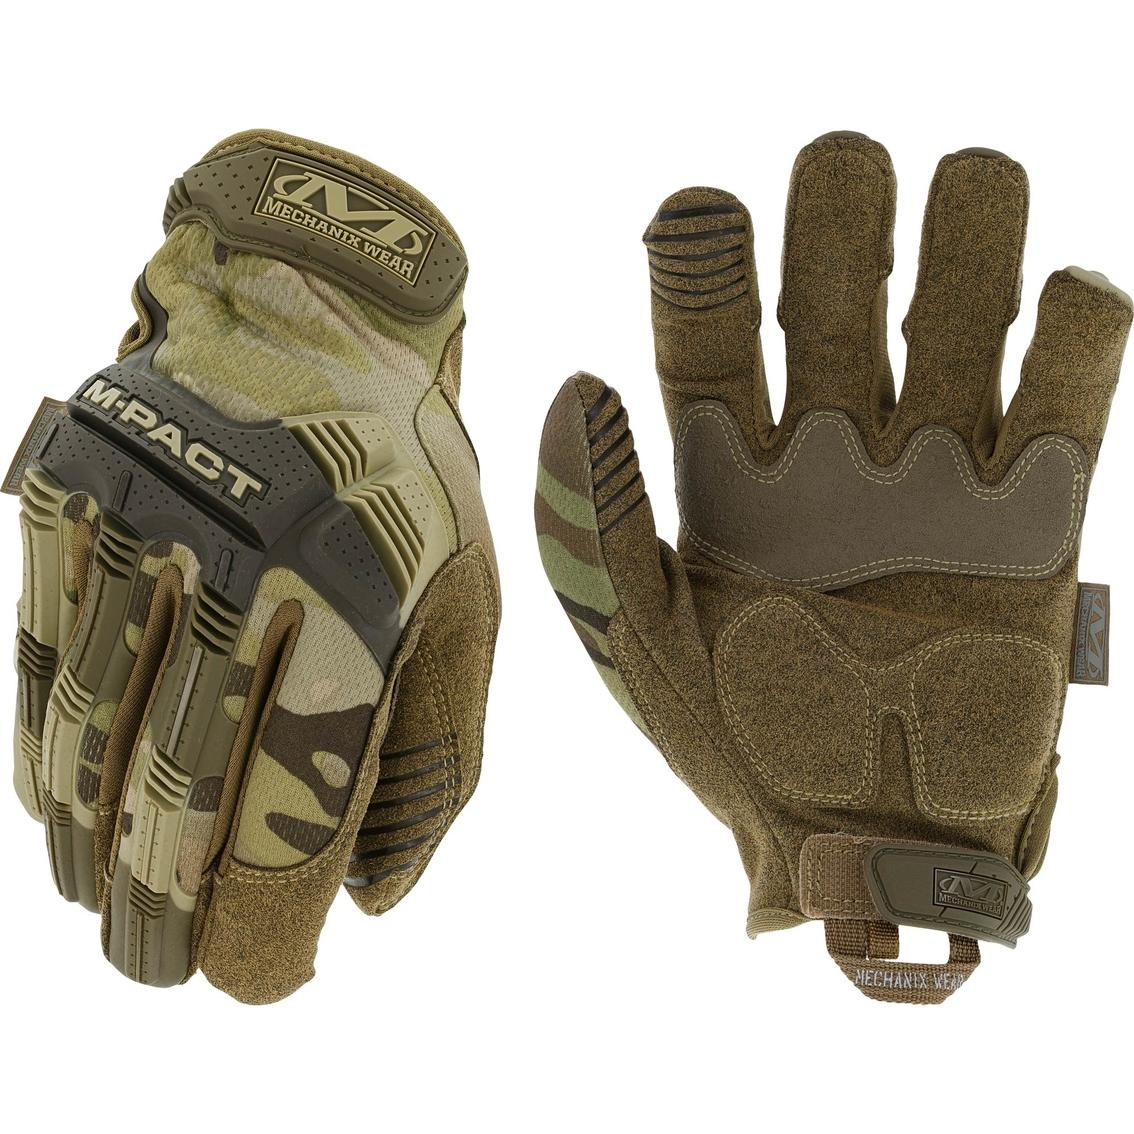 Mechanix Wear M-pact Multicam Impact Tactical Gloves | Gloves ...